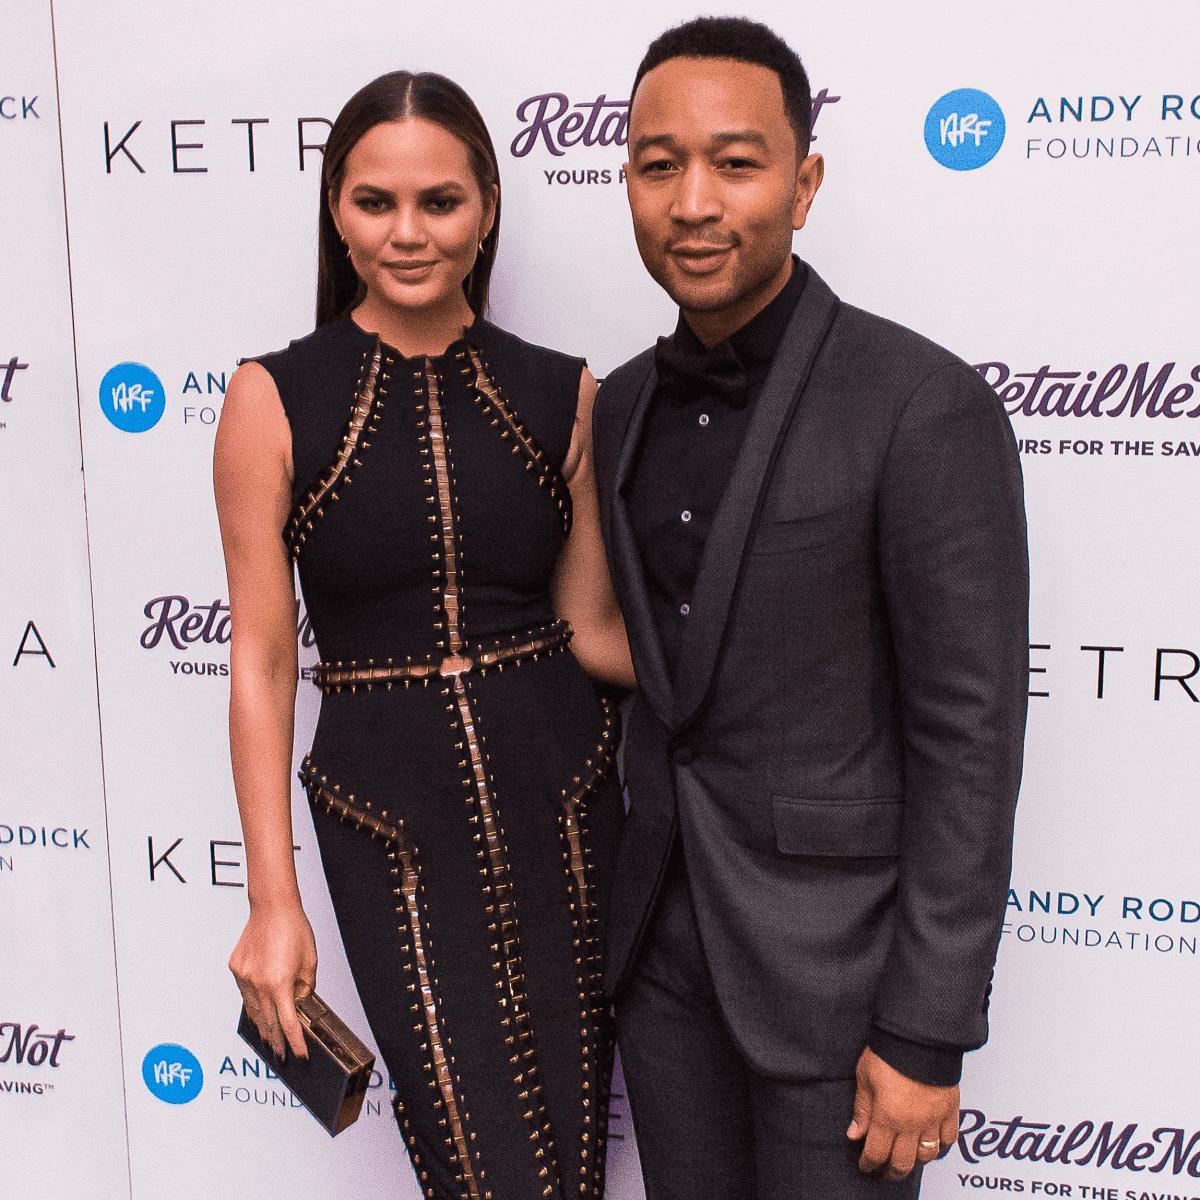 Andy Roddick Foundation Gala 2016 Chrissy Teigen John Legend